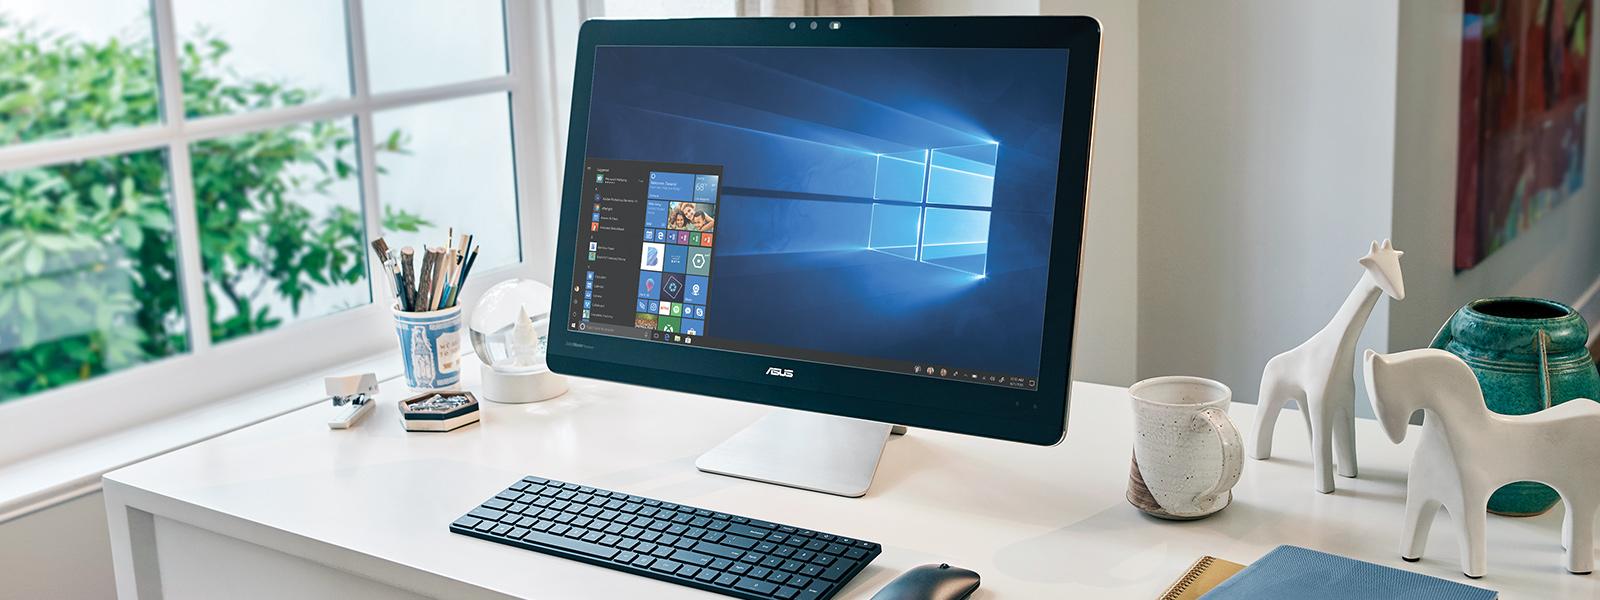 ASUS 桌上型電腦放在桌上,旁邊放著無線滑鼠和鍵盤